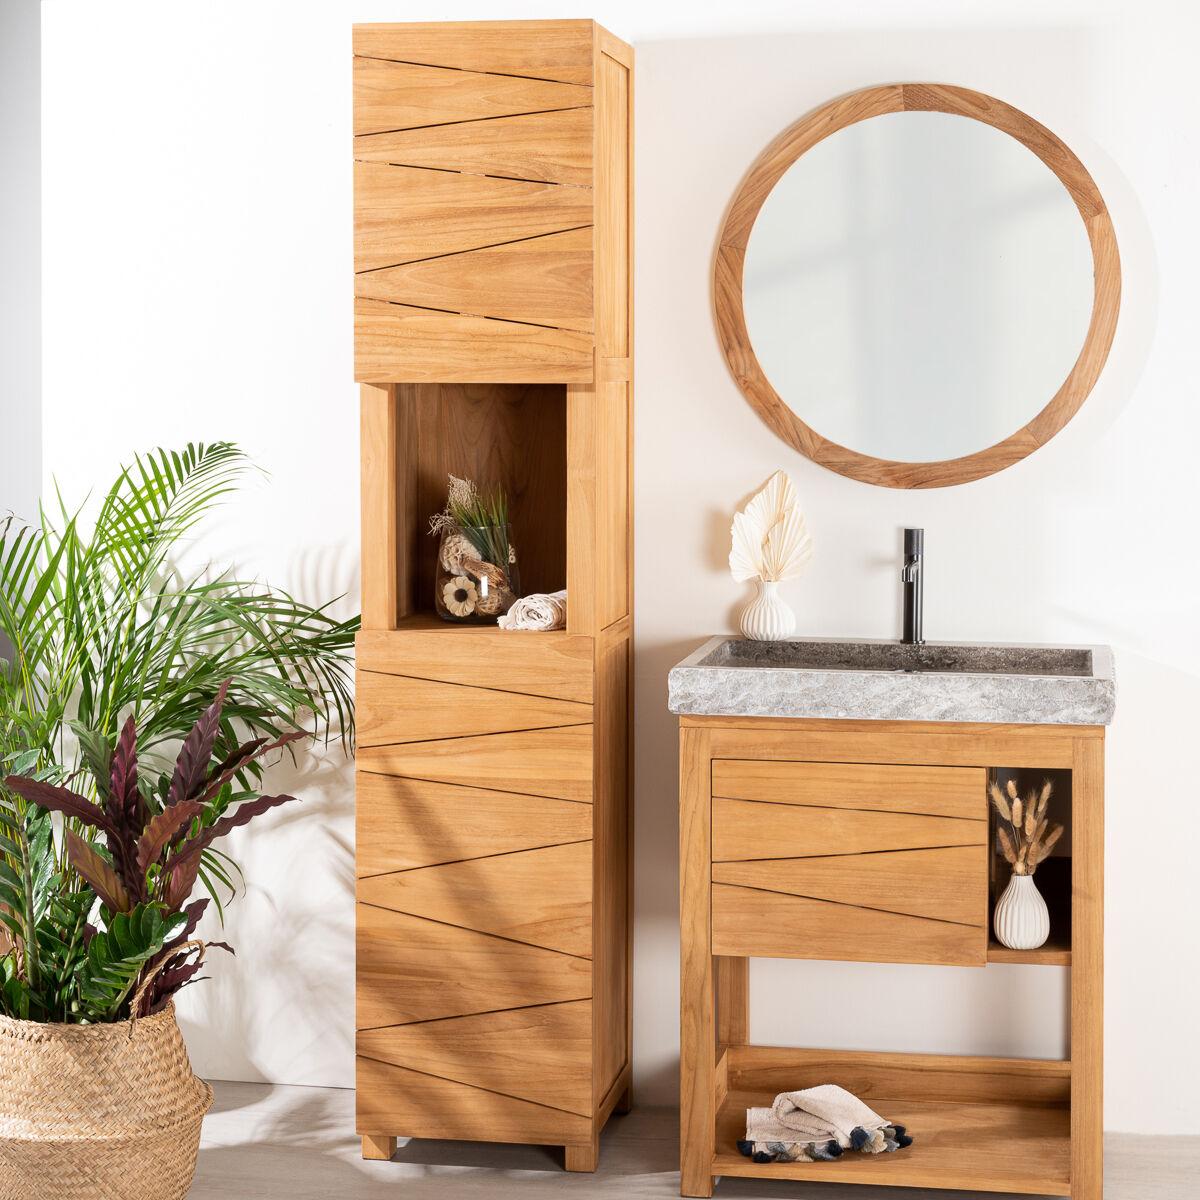 Wanda Collection Colonne salle de bain en teck massif Harmonie 190cm